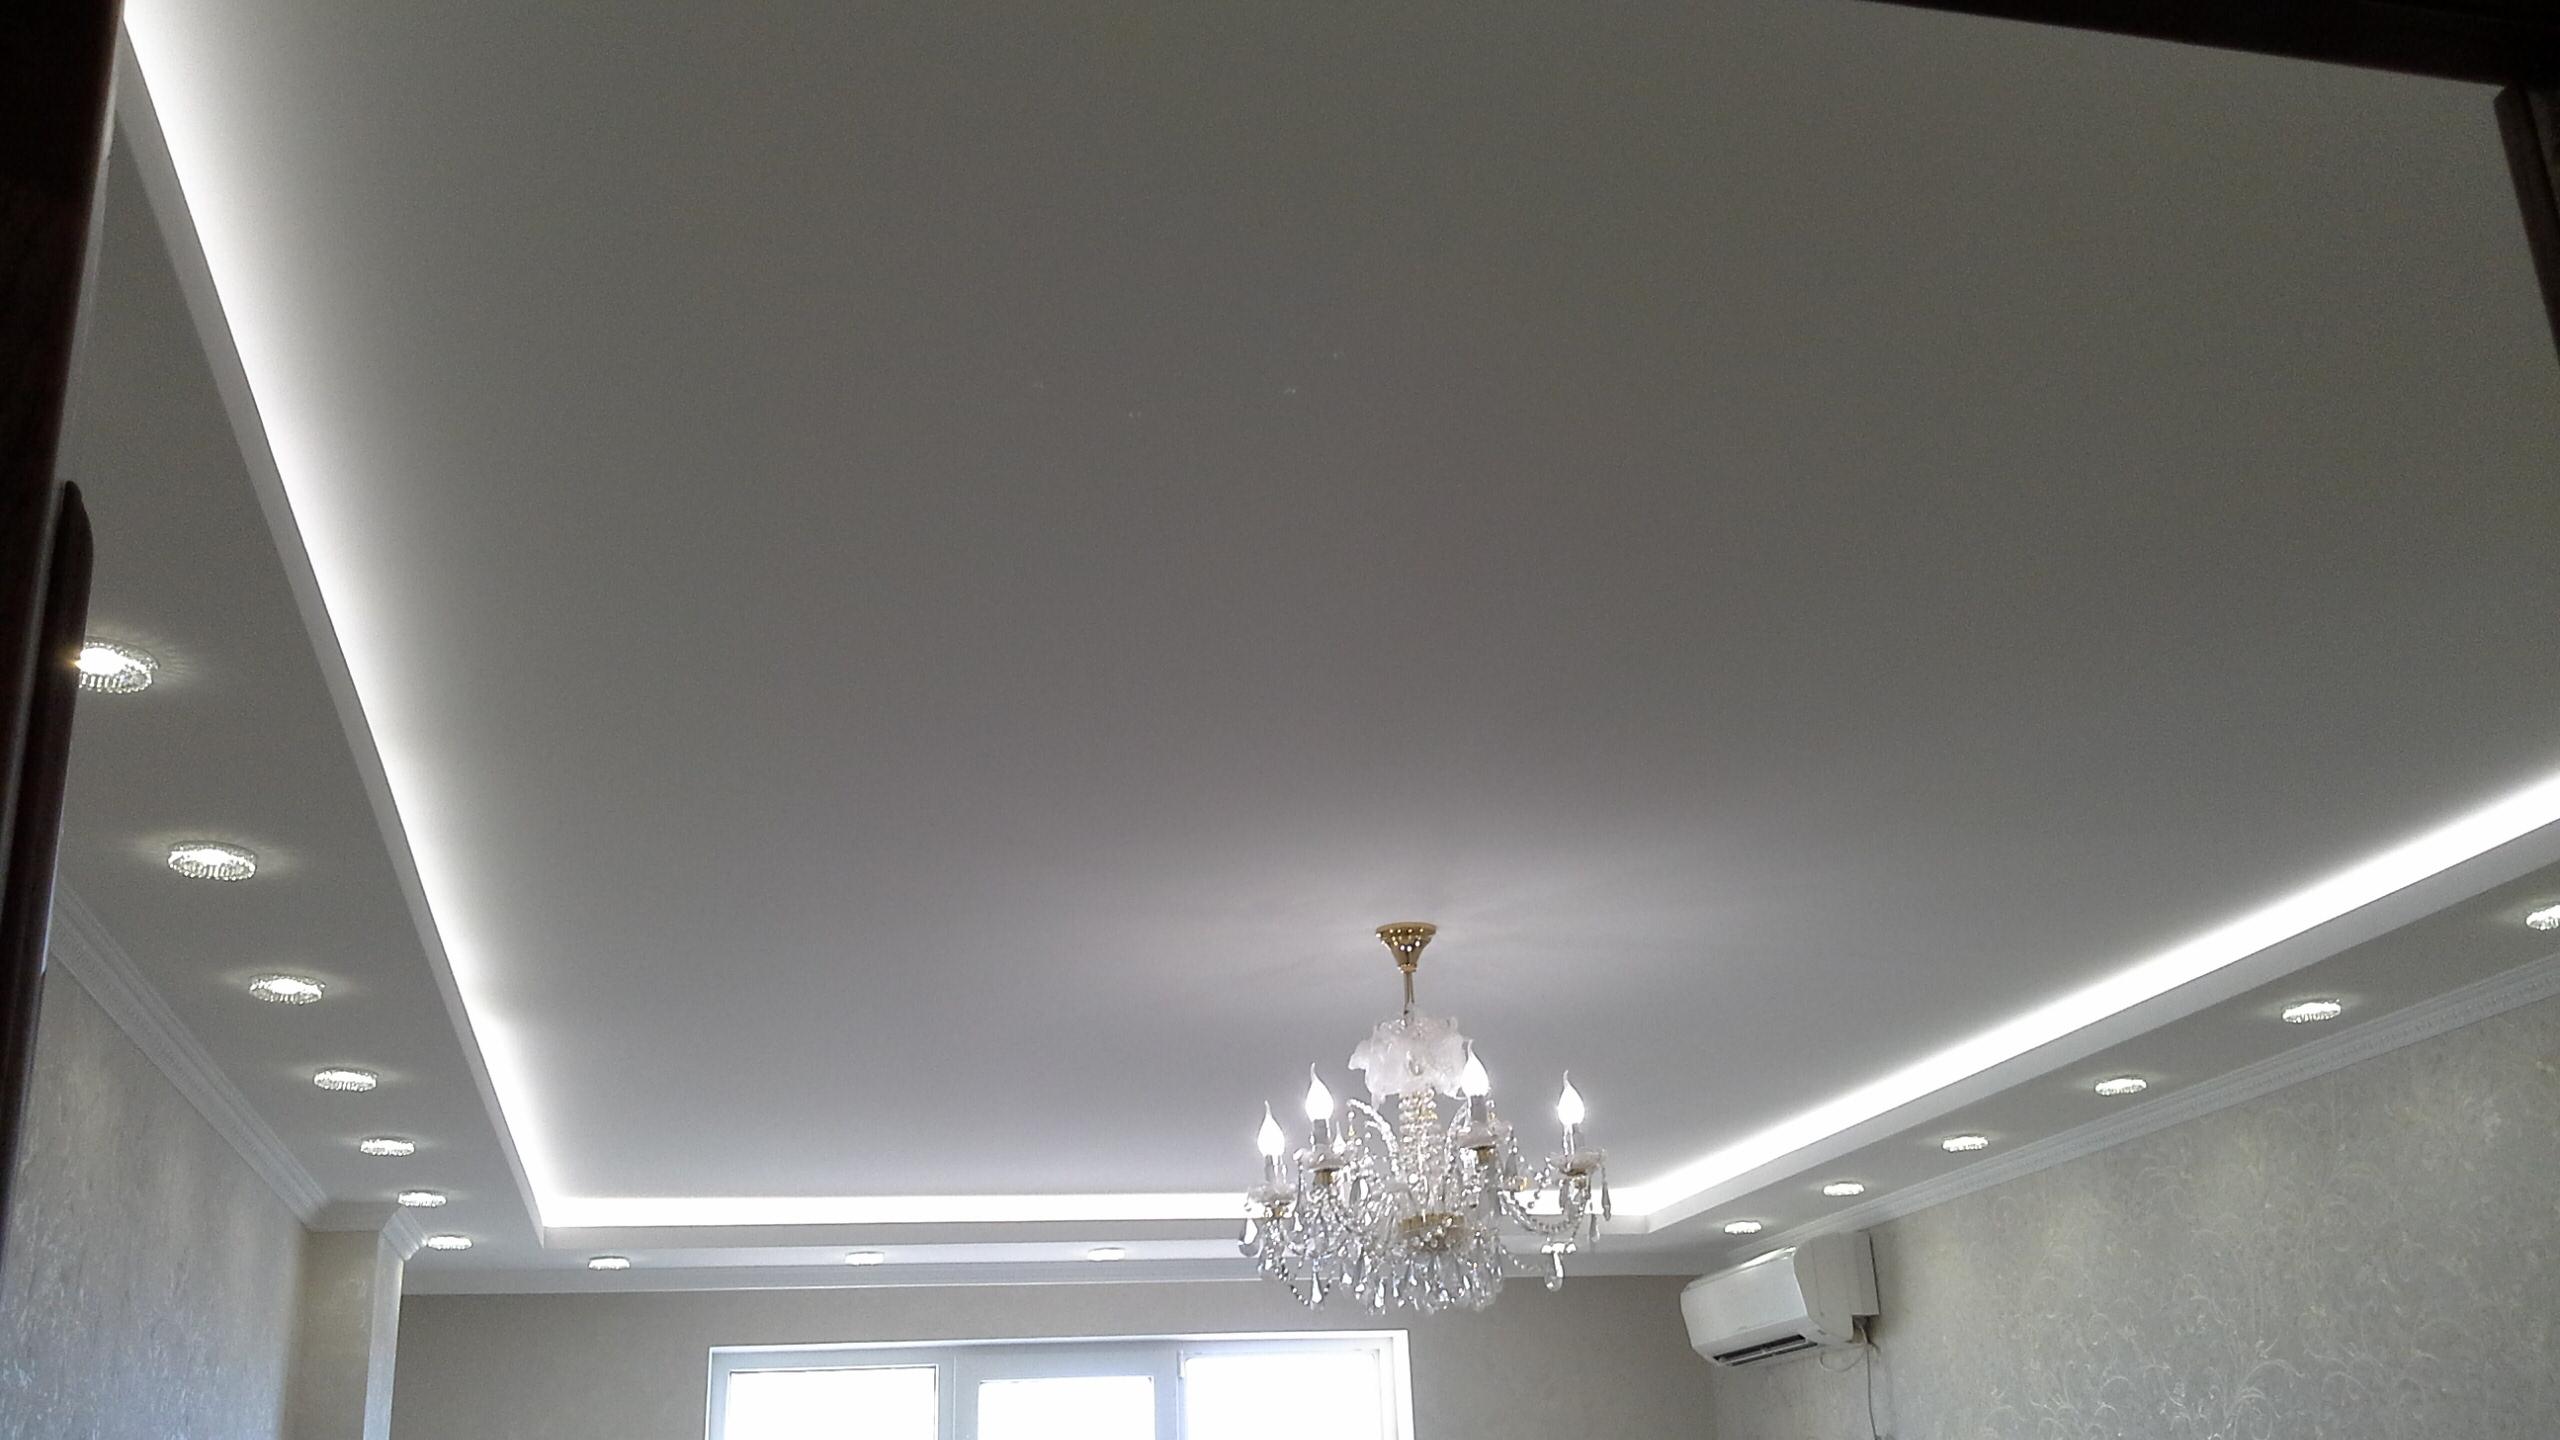 Тканевые натяжные потолки | Фасады кухоньФасады кухонь